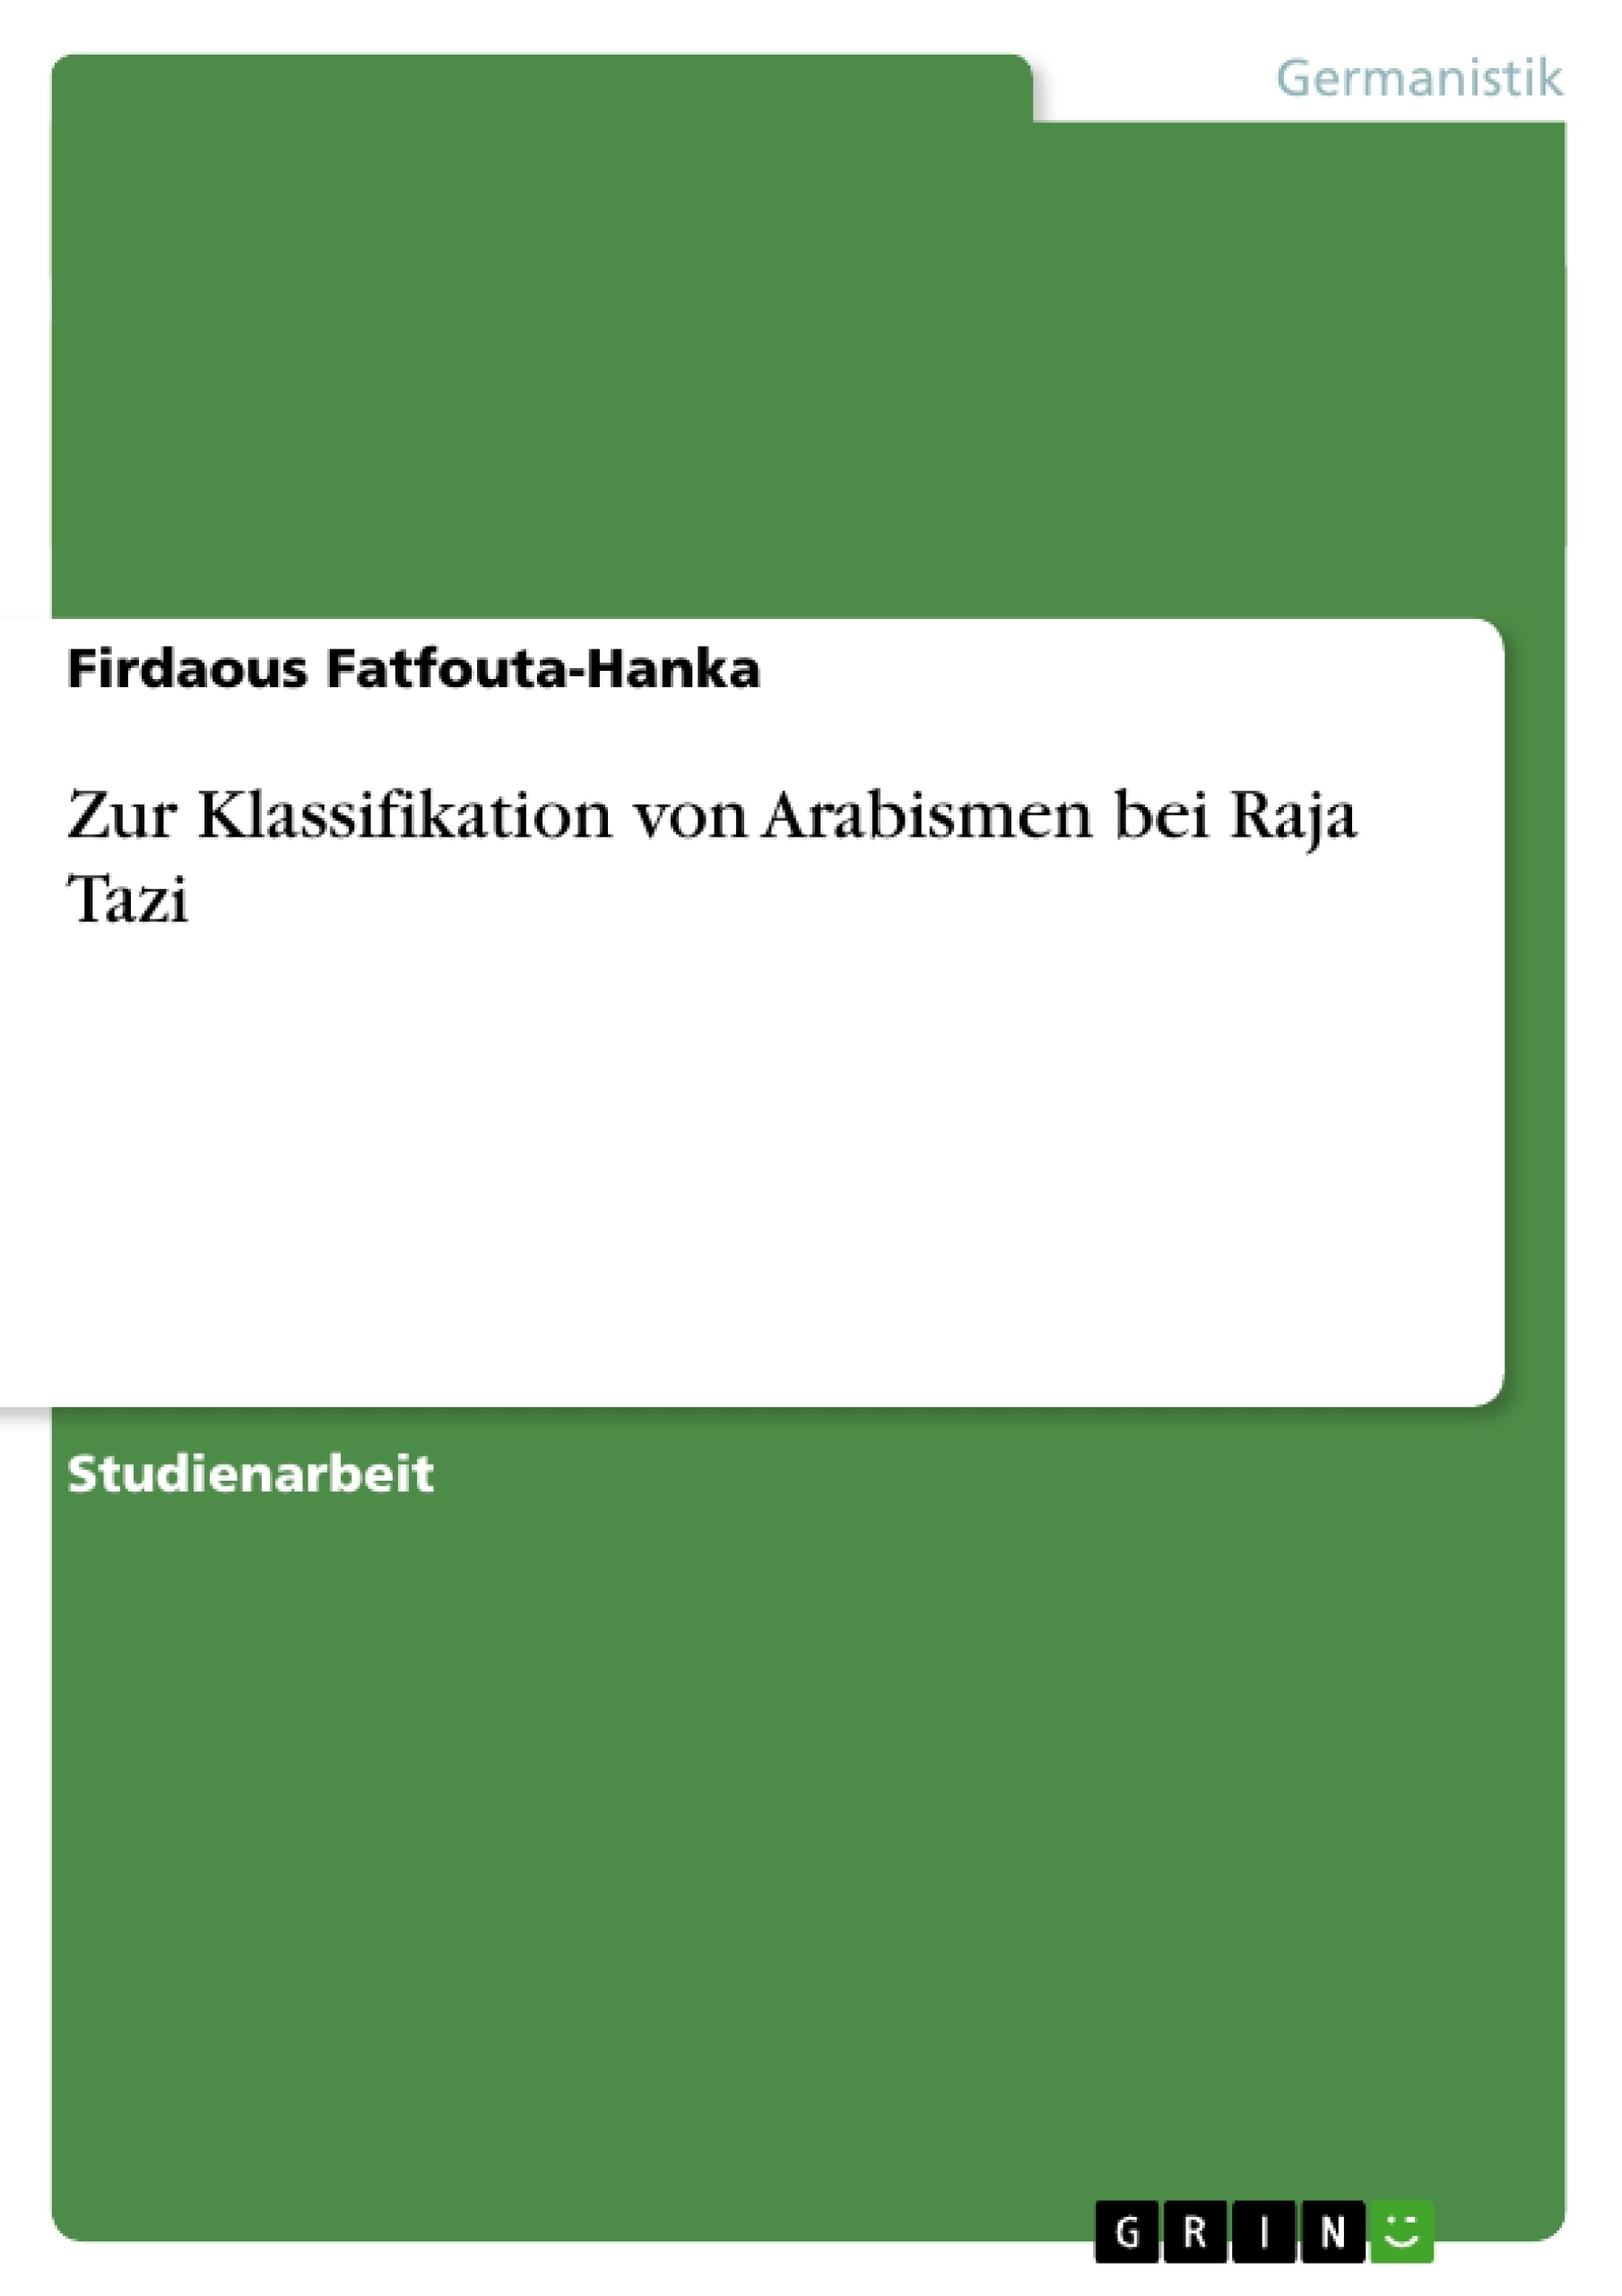 Titel: Zur Klassifikation von Arabismen bei Raja Tazi